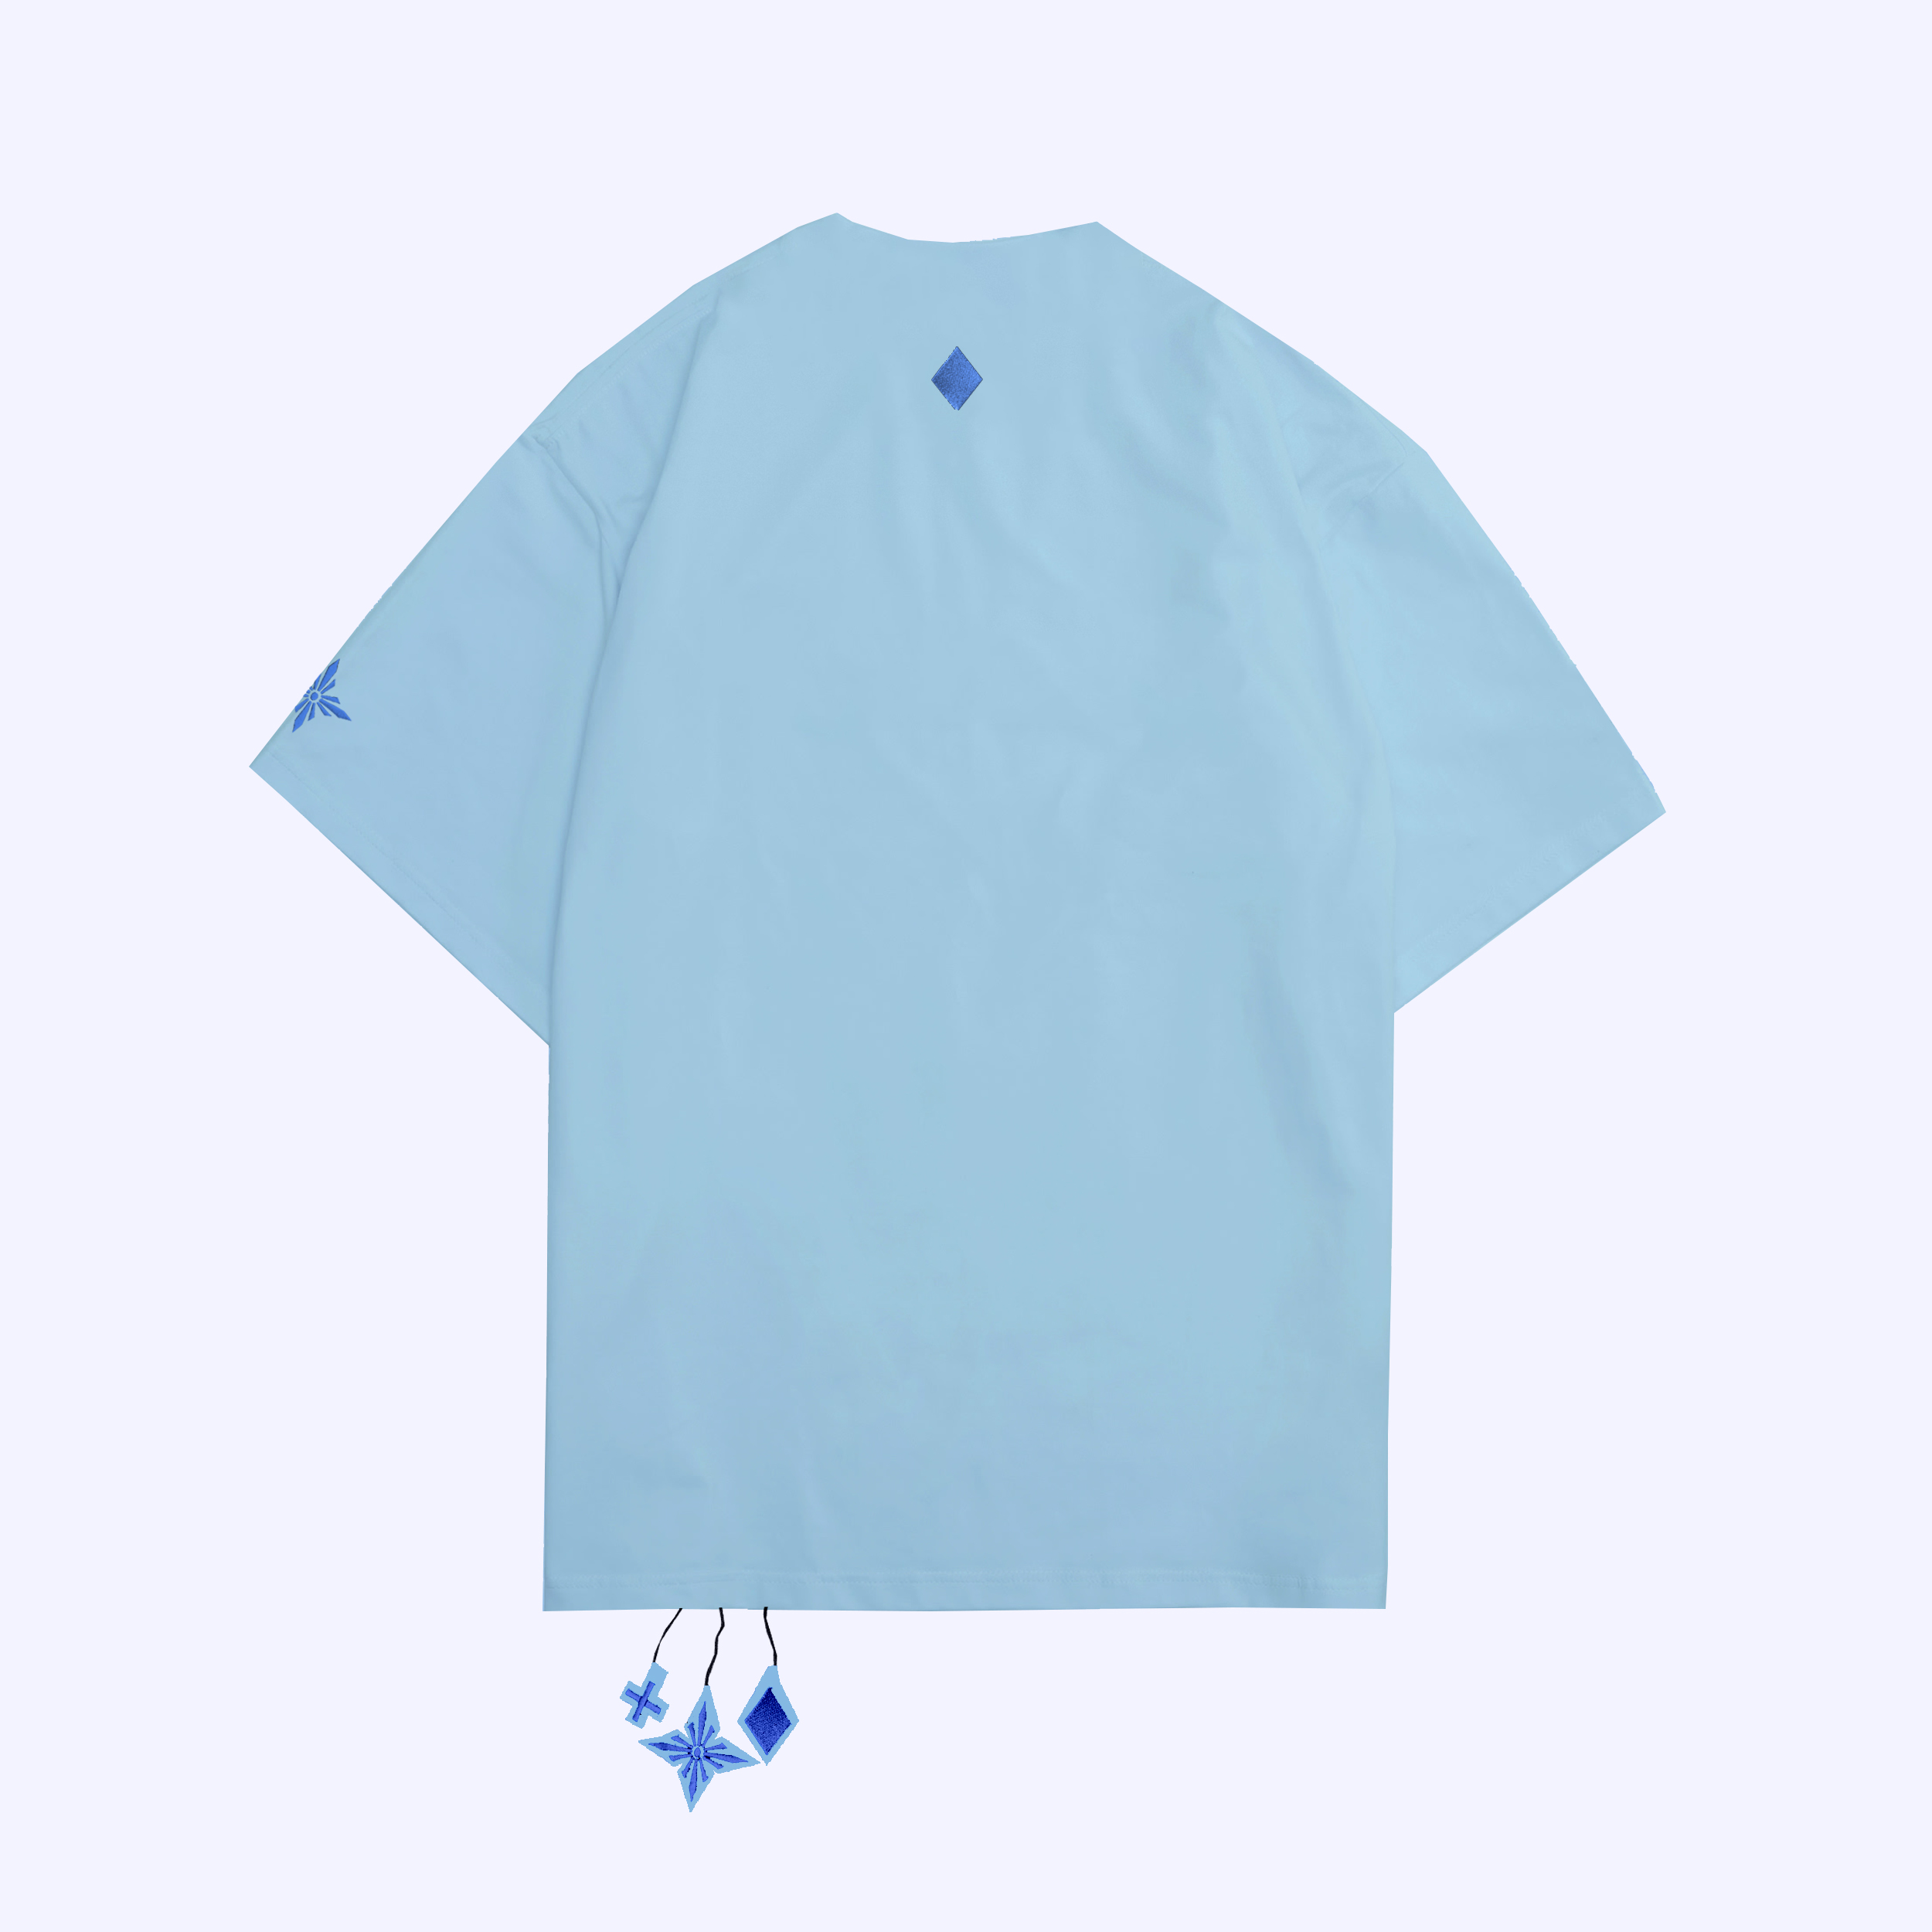 Sapphire Twinkle T-Shirt